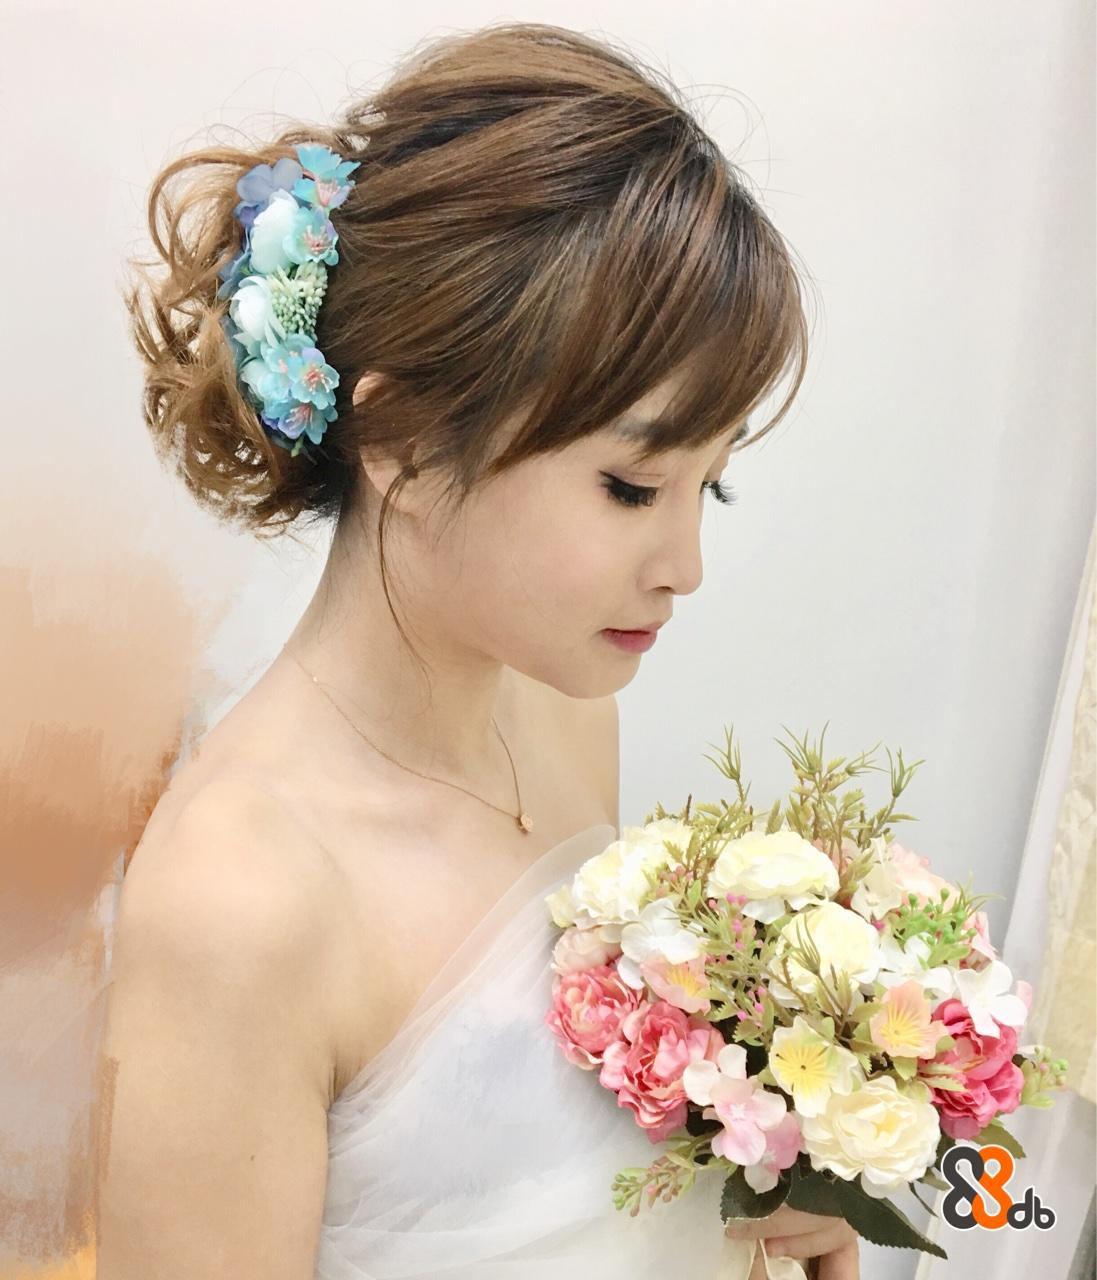 hair,flower,bride,hair accessory,headpiece